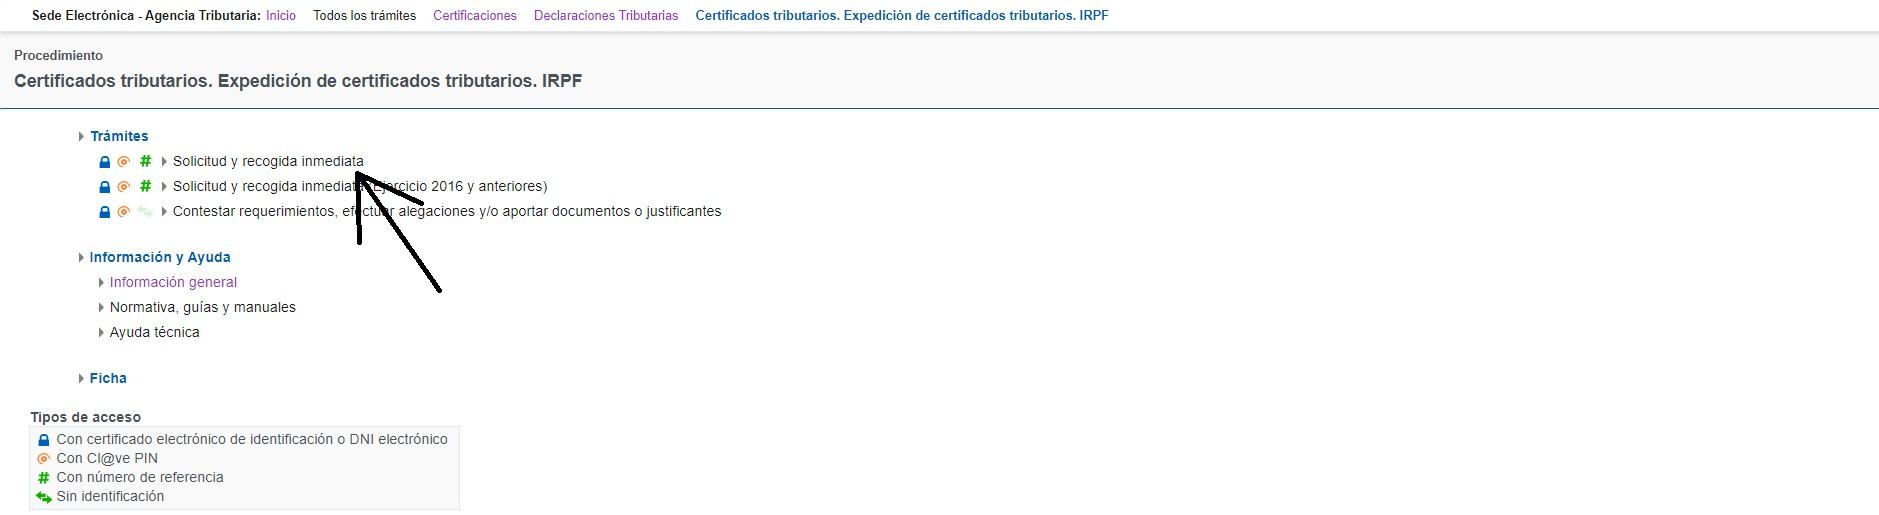 solicitud recogida inmediata certificados tributarios